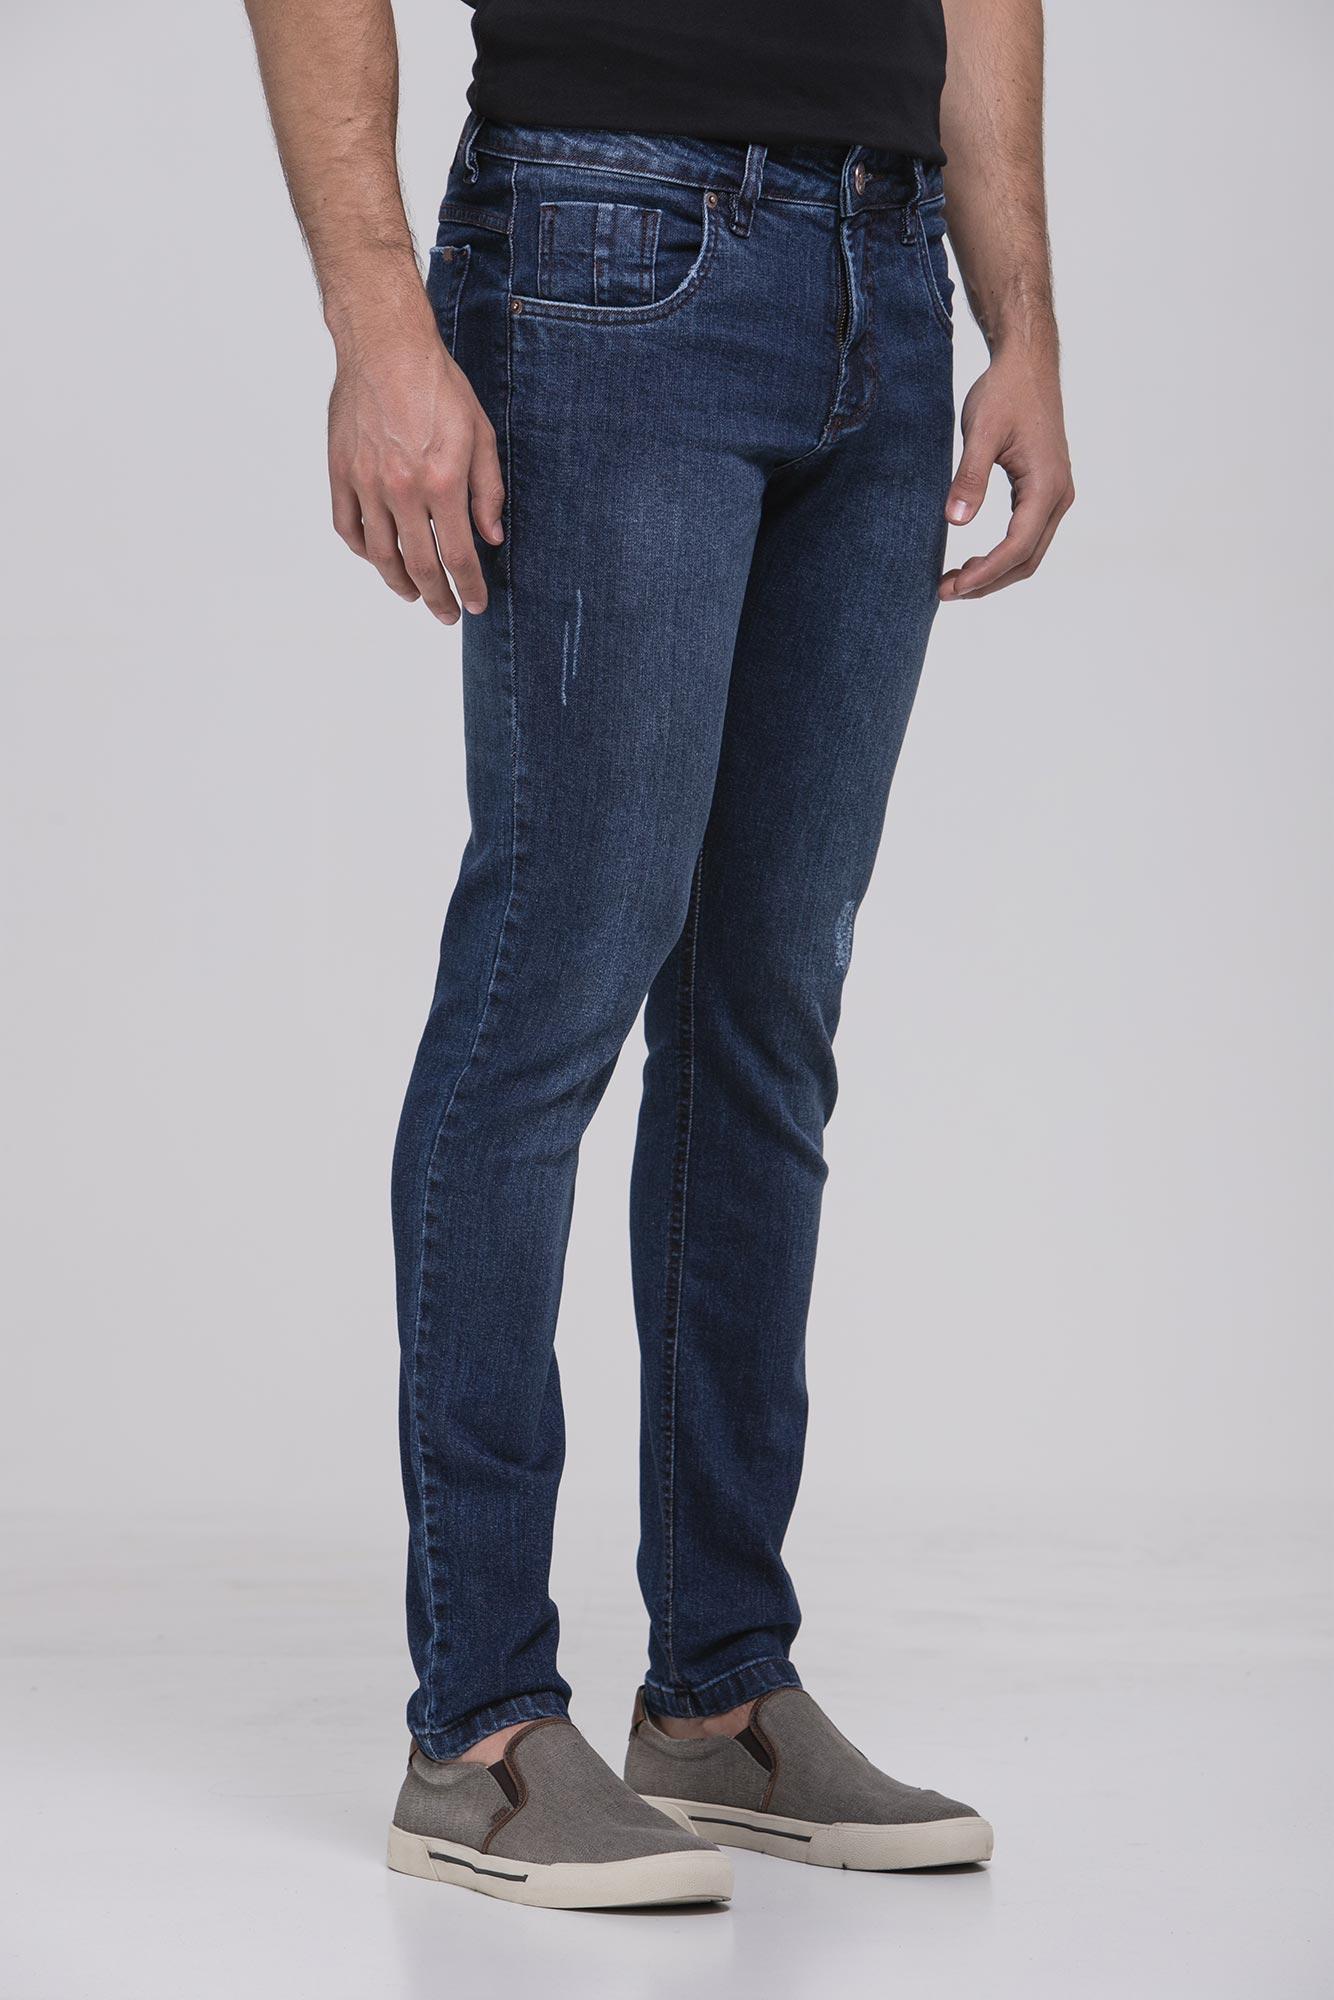 Calça Jeans Ocean Blue